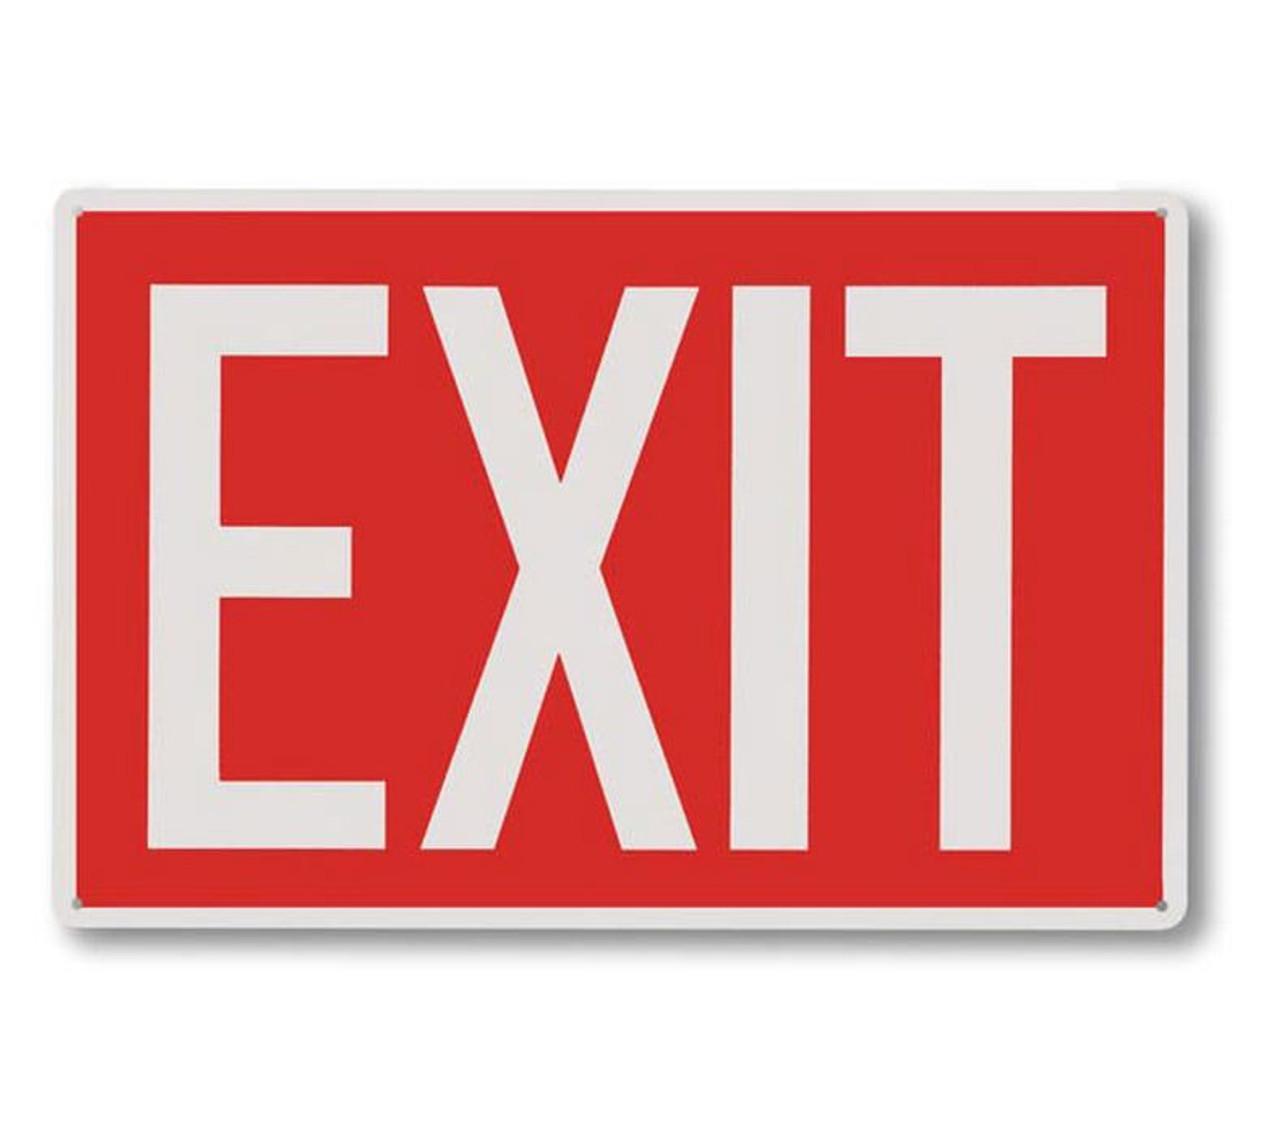 "RP 112 Rigid Plastic Directional Exit Signs 12"" x 8"""